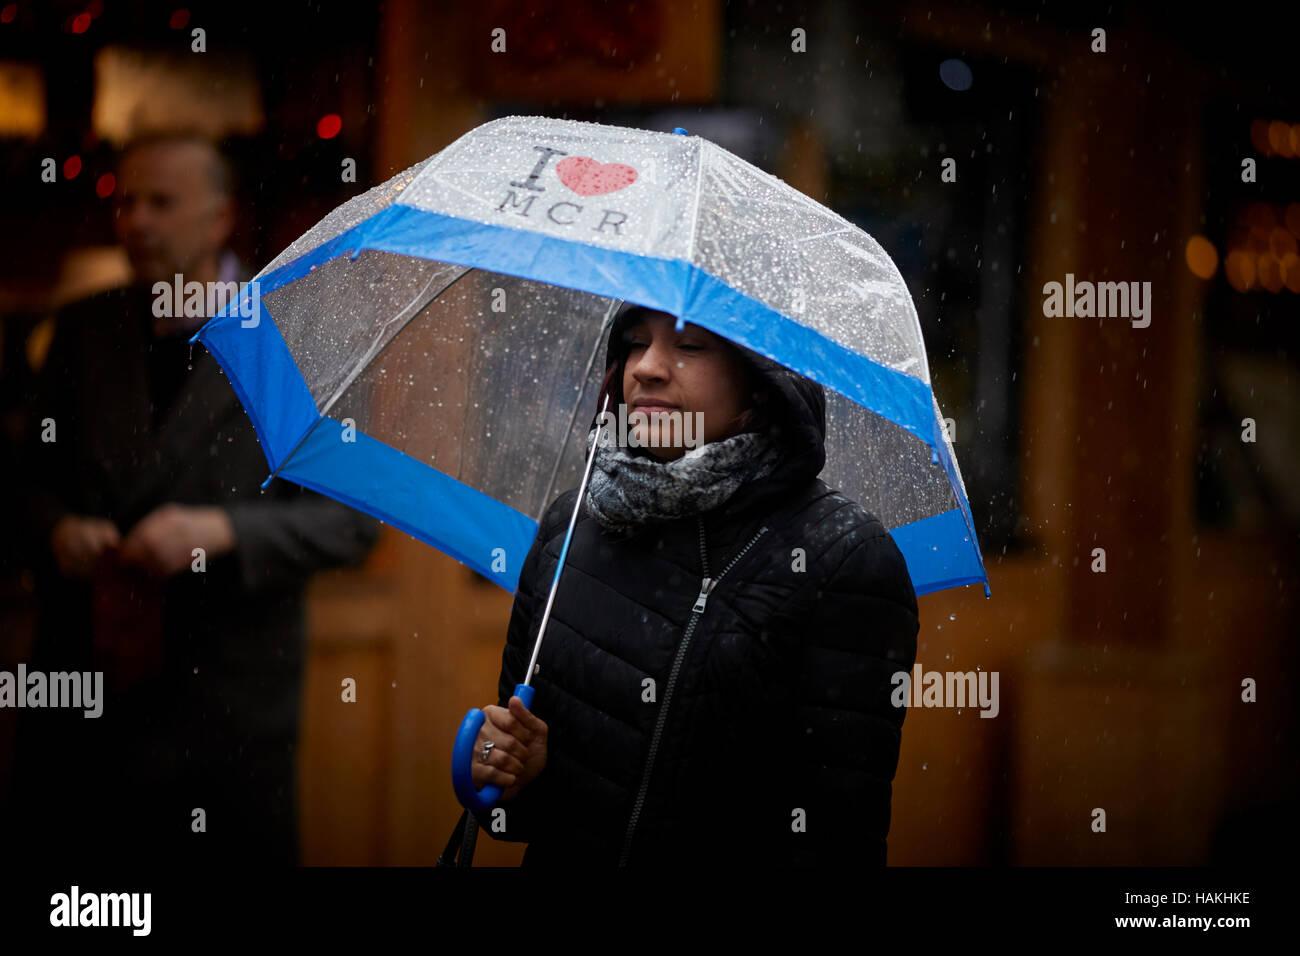 Manchester christmas markets rain  I love MCR umbrella up used street again lady damp - Stock Image